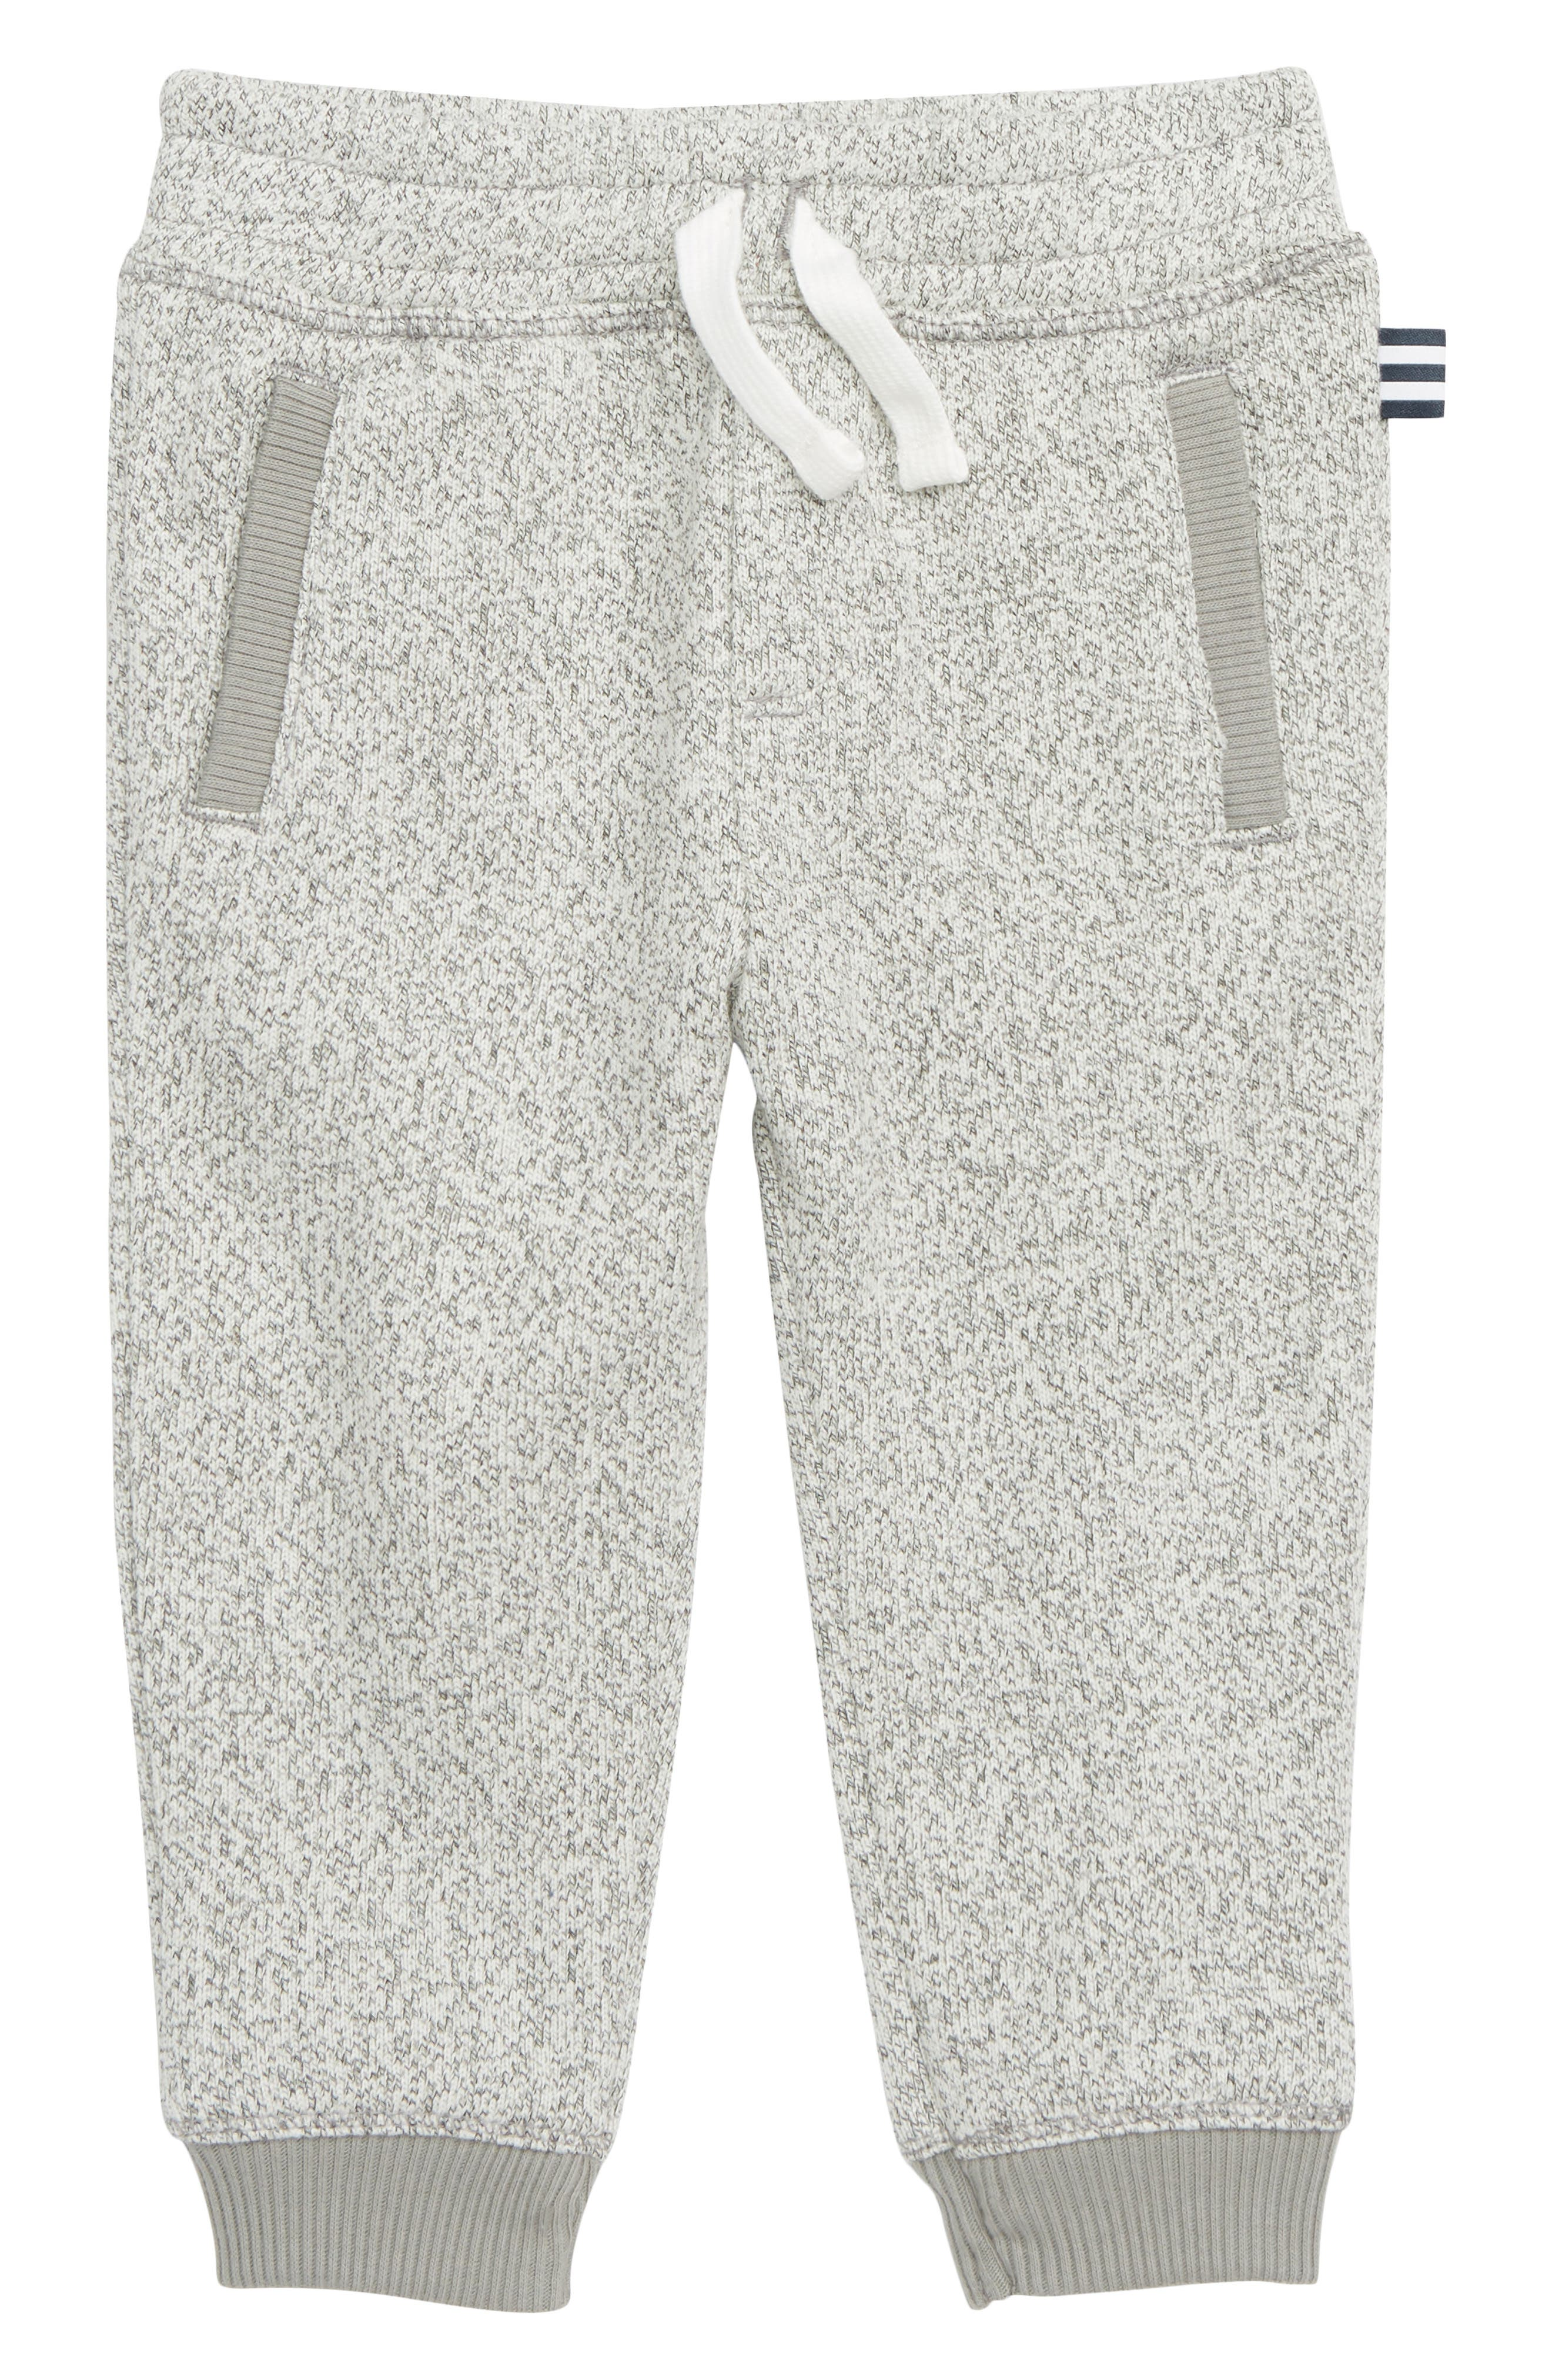 Marled Fleece Jogger Pants, Main, color, FLINT GRAY